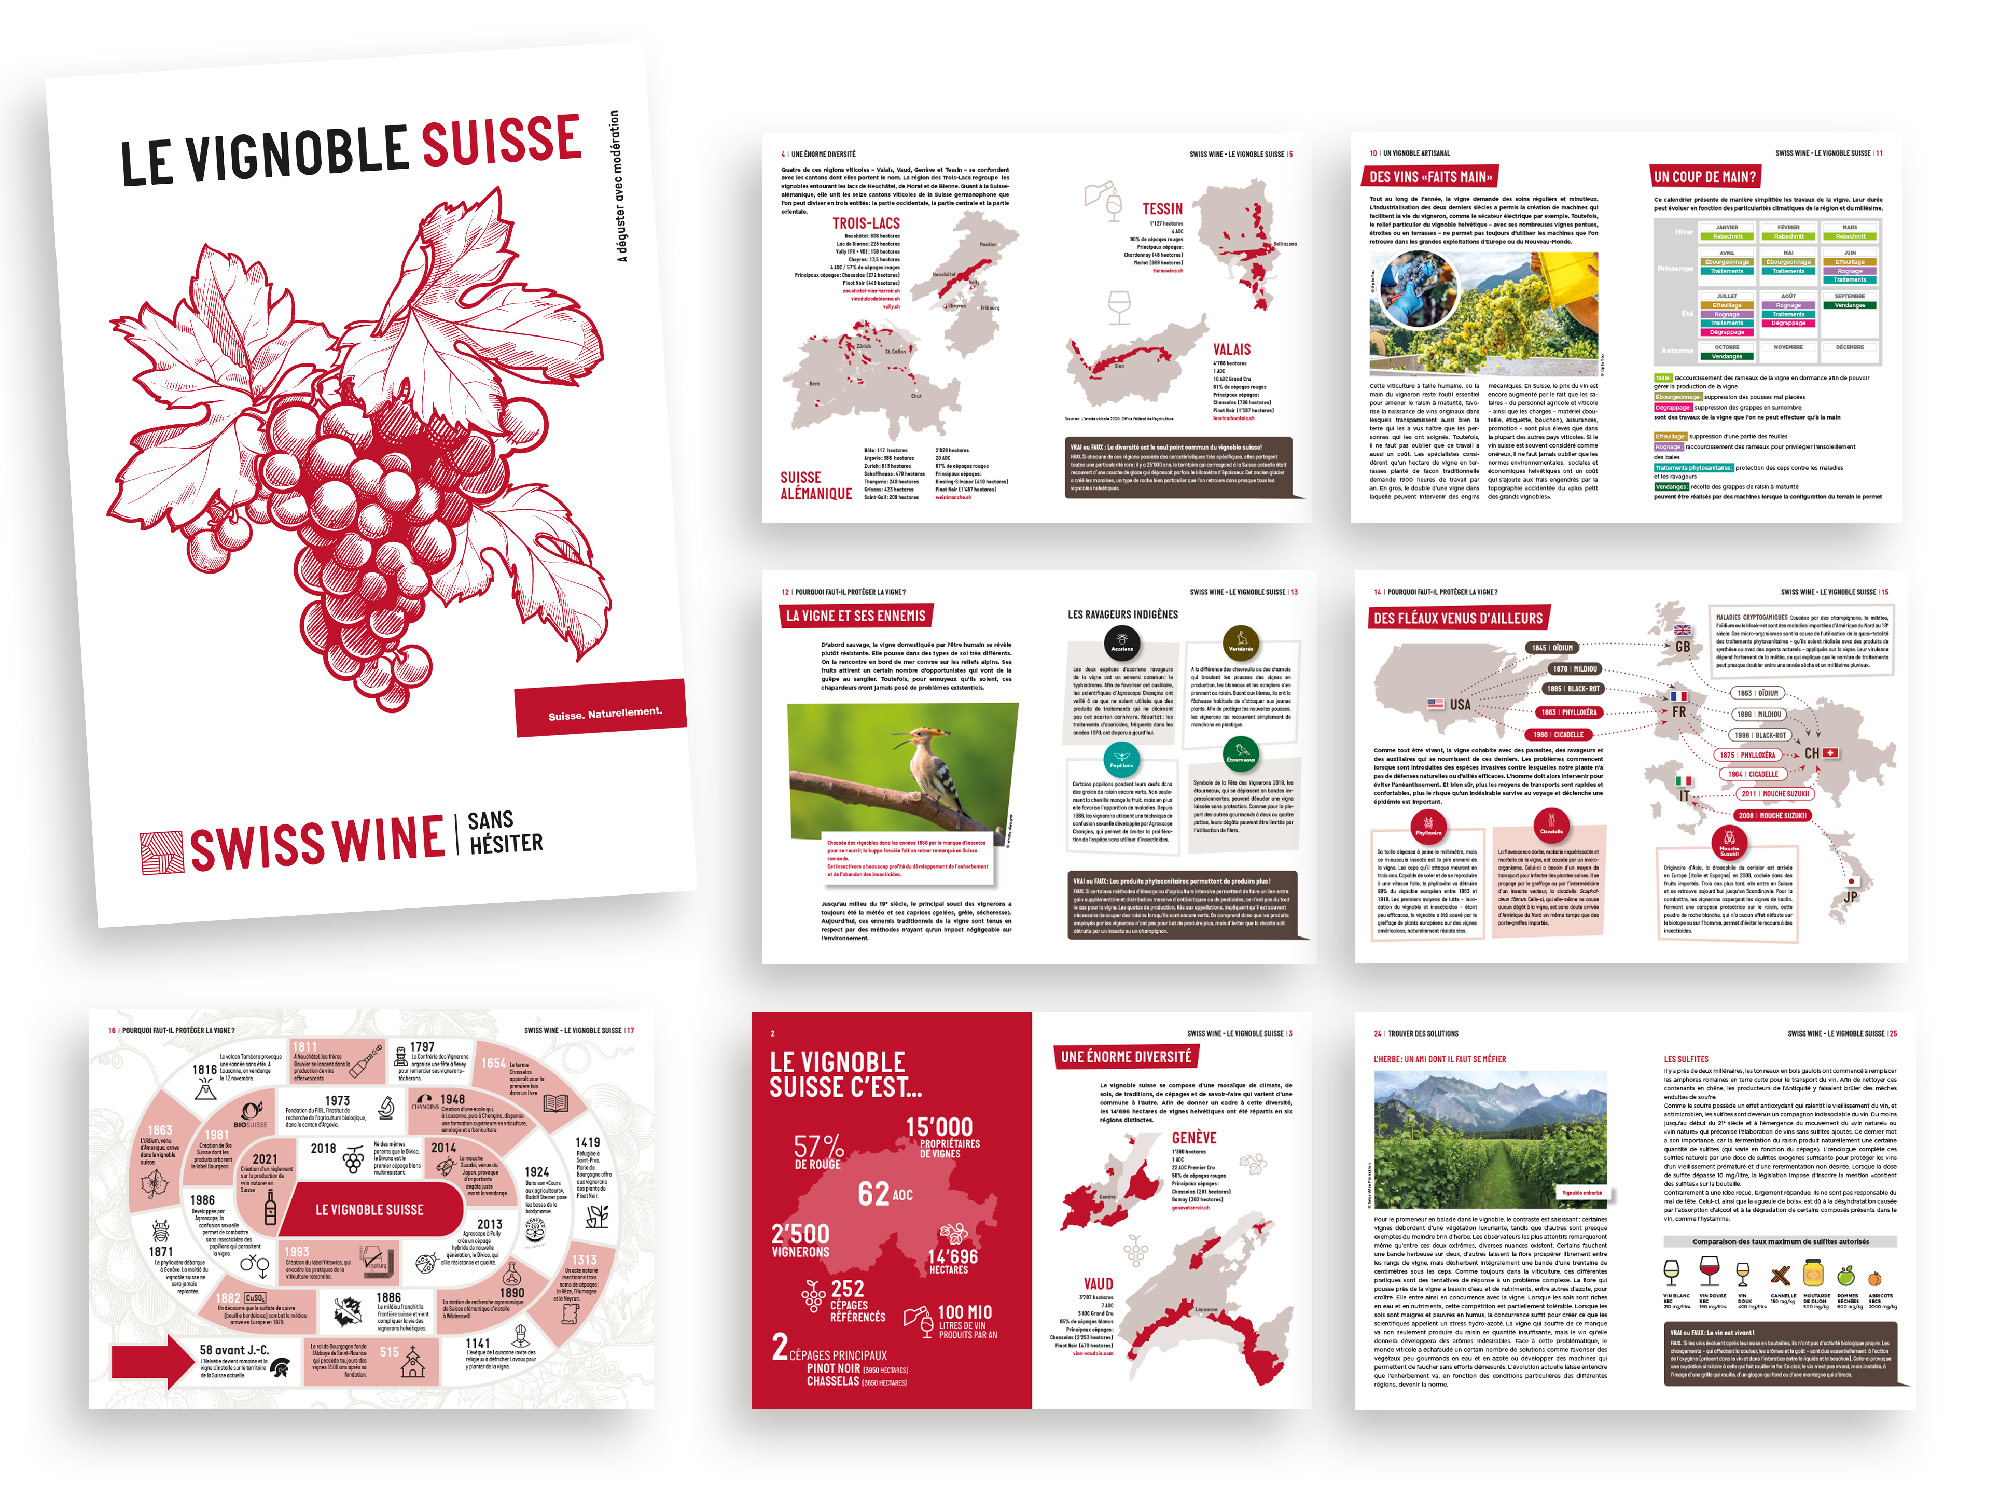 Le vignoble suisse - SWISSWINE